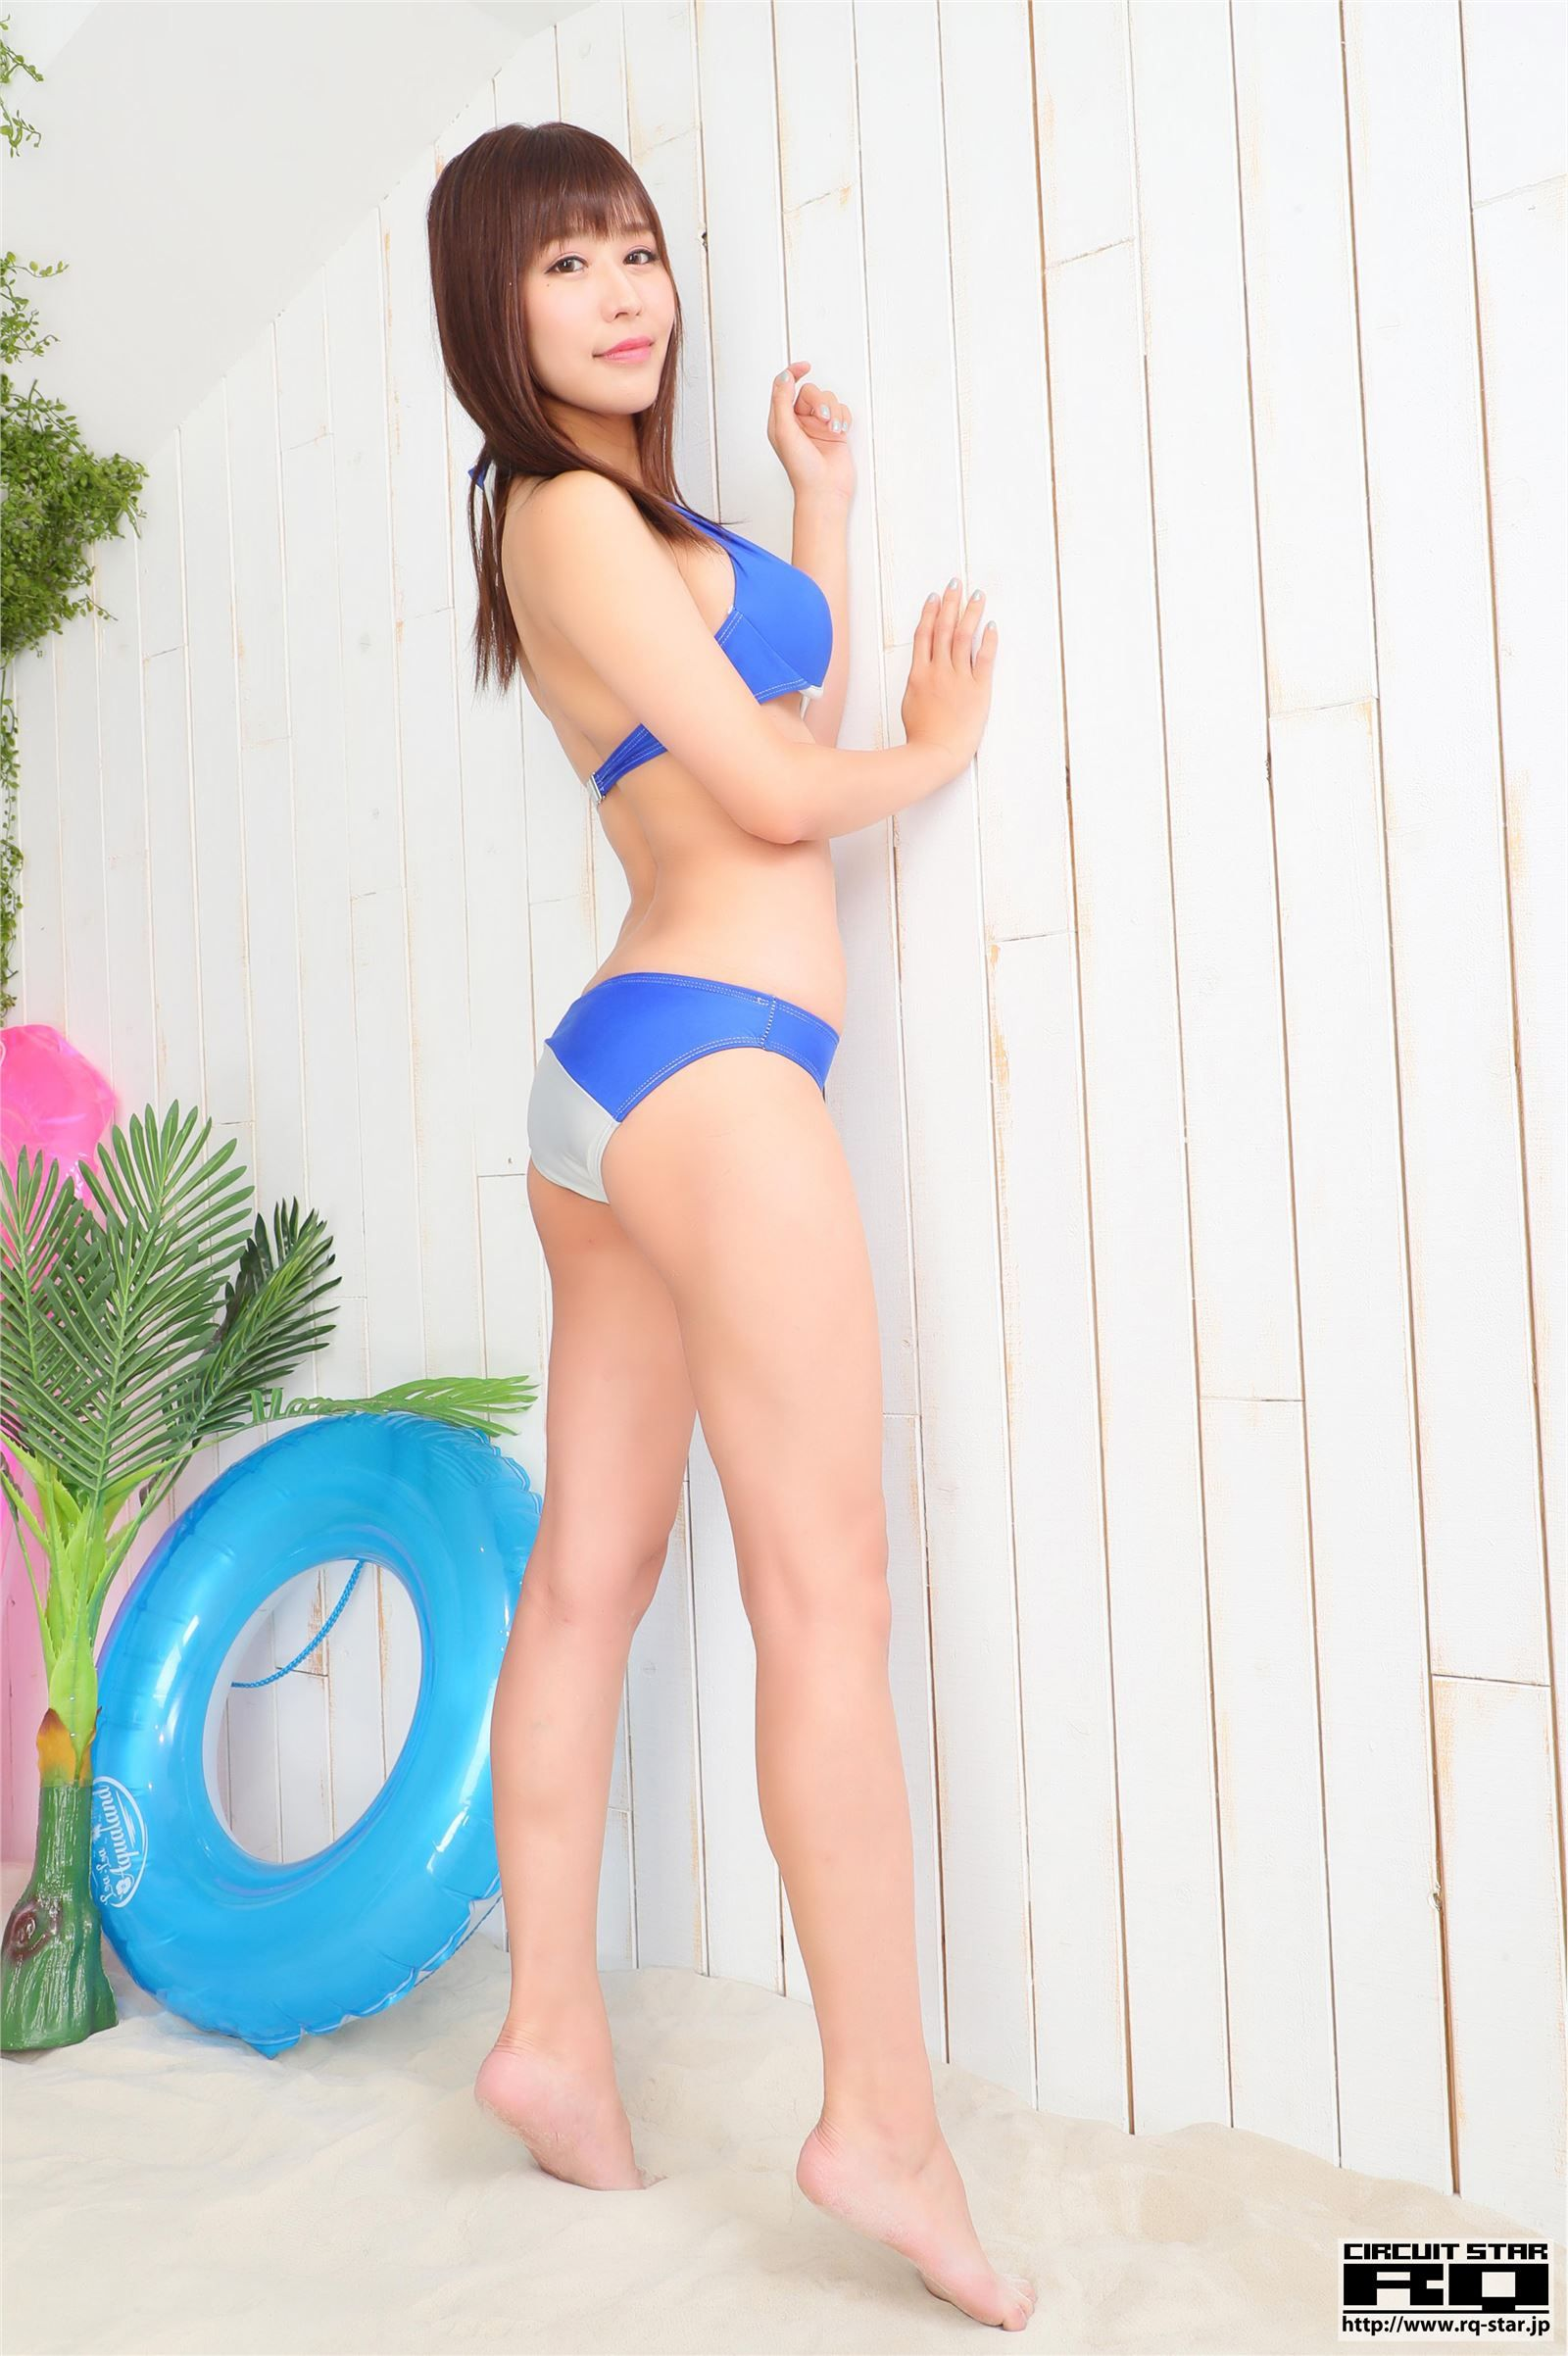 [RQ STAR美女] 2018.08.04 Aya Miyazaki 宮崎彩 Swim Suits[80P] RQ STAR 第4张